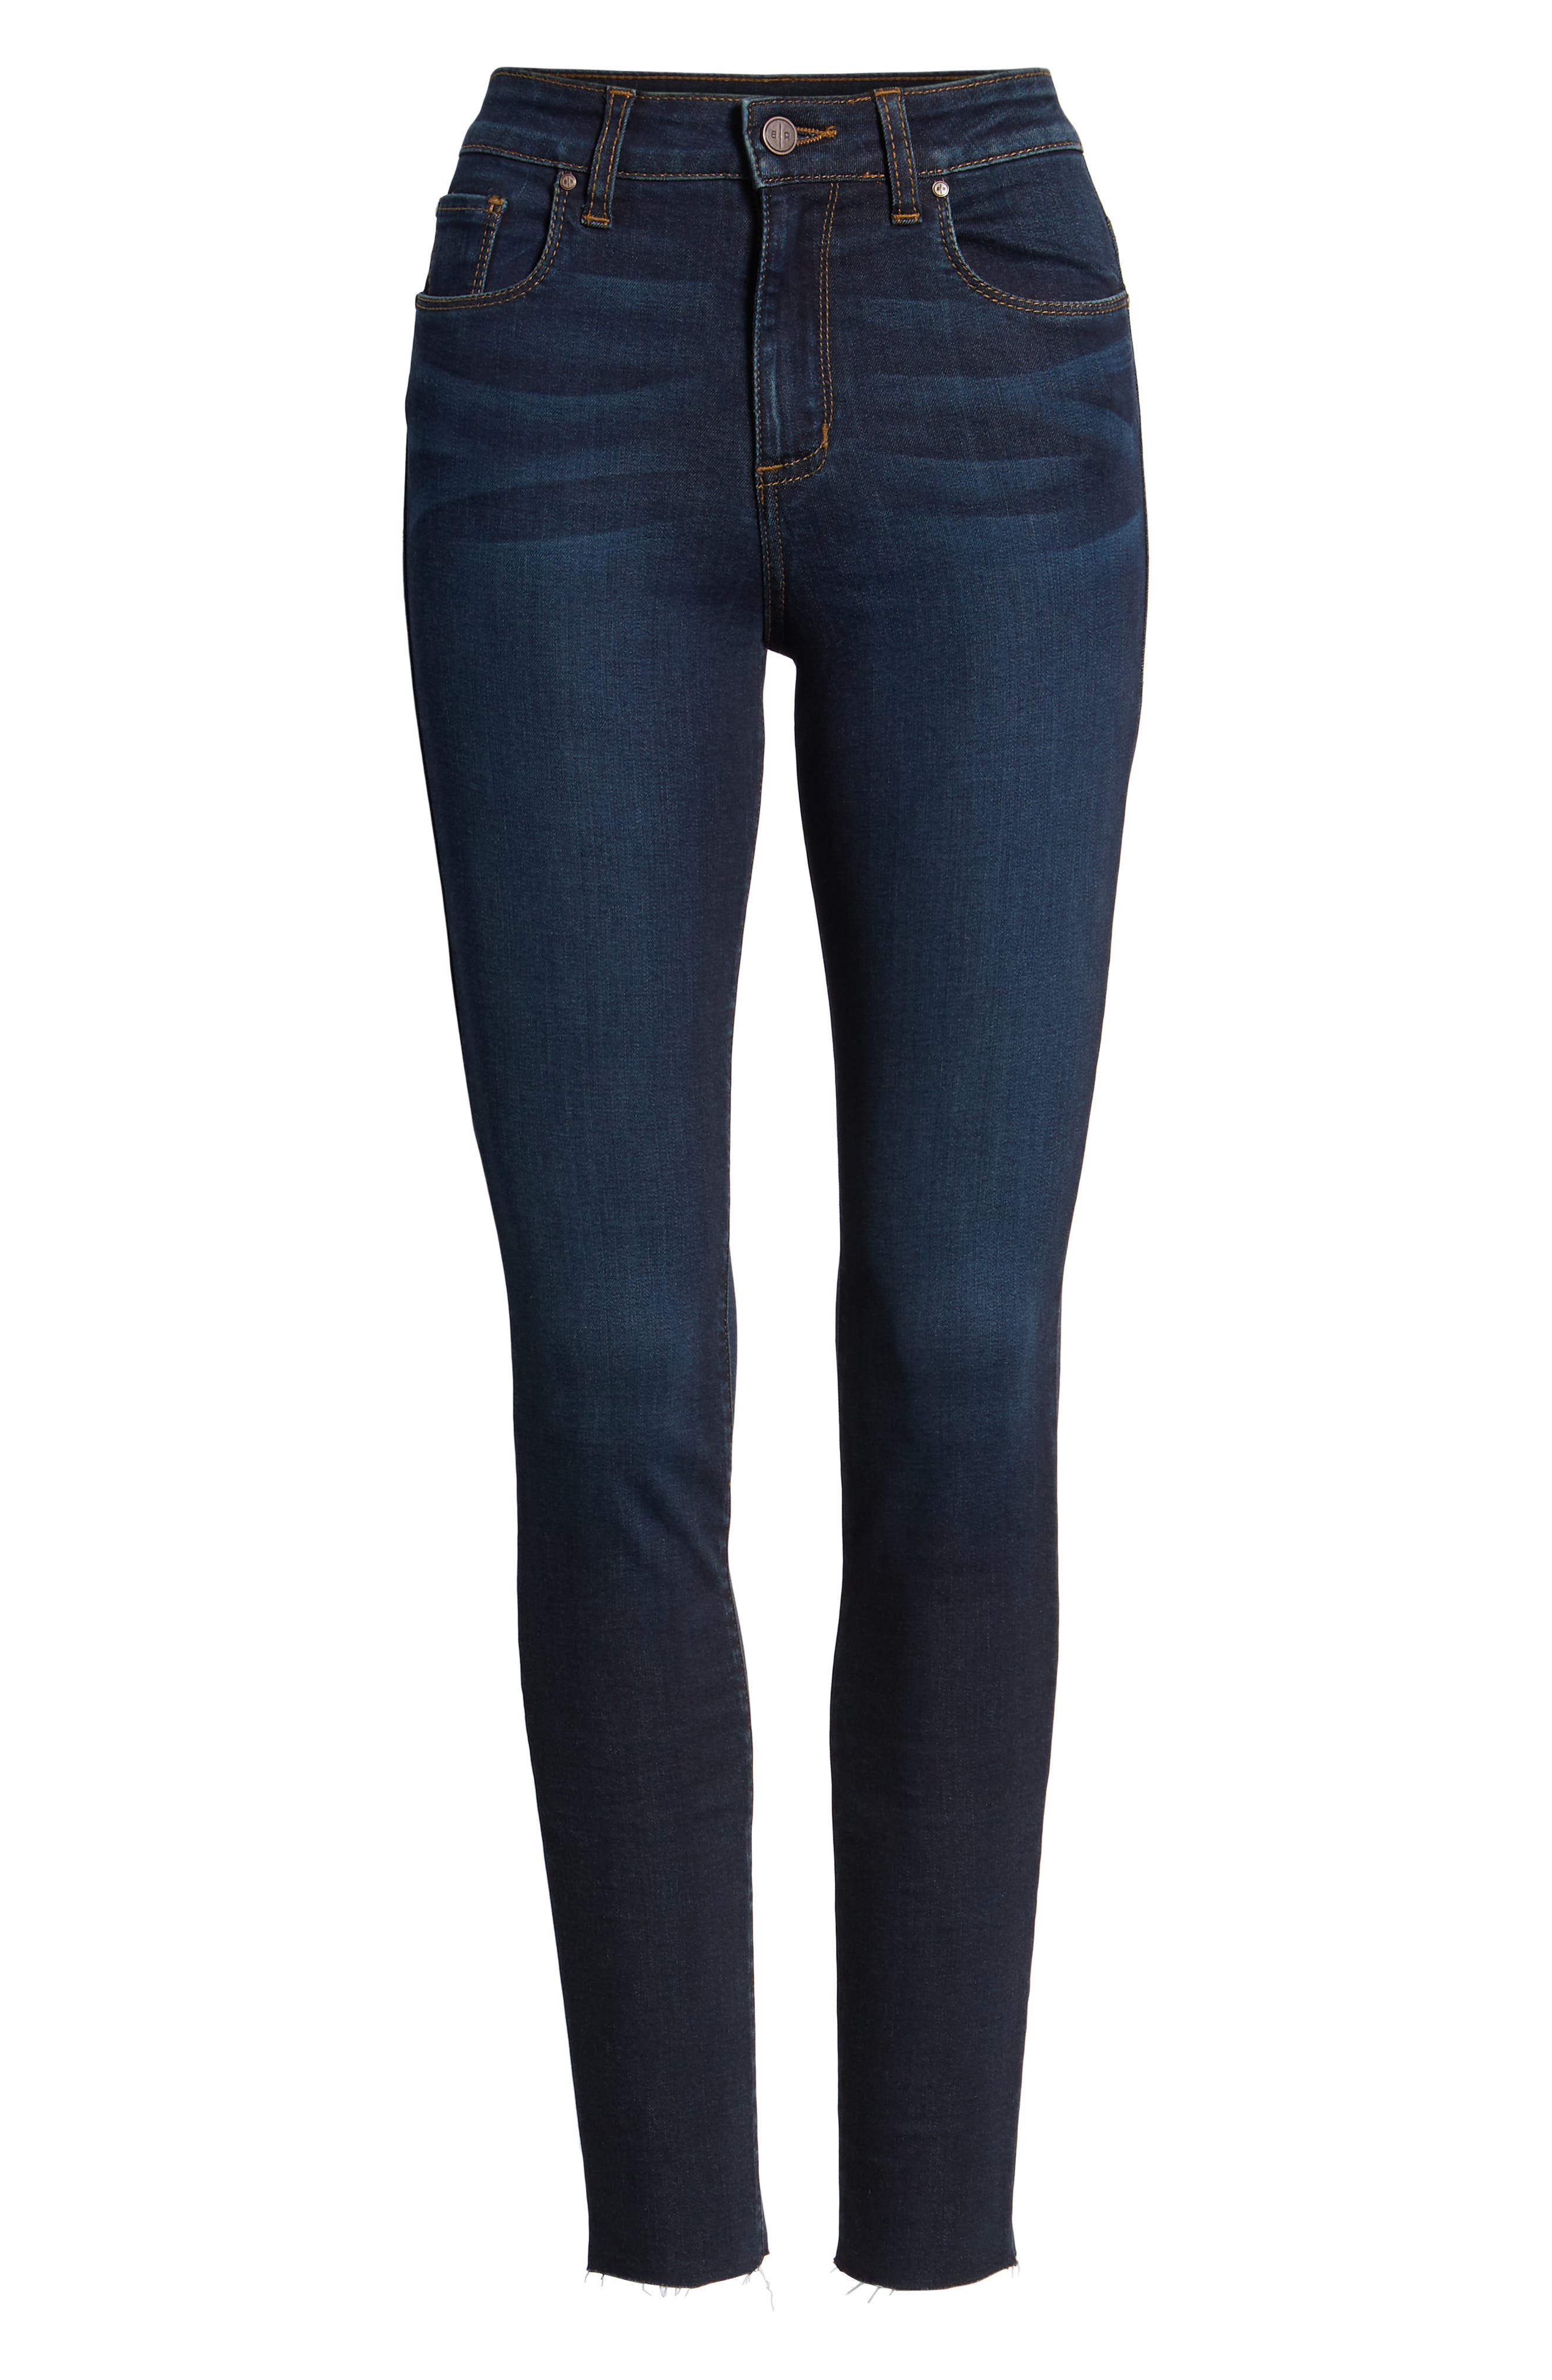 High Waist Cutoff Skinny Jeans,                             Alternate thumbnail 7, color,                             400